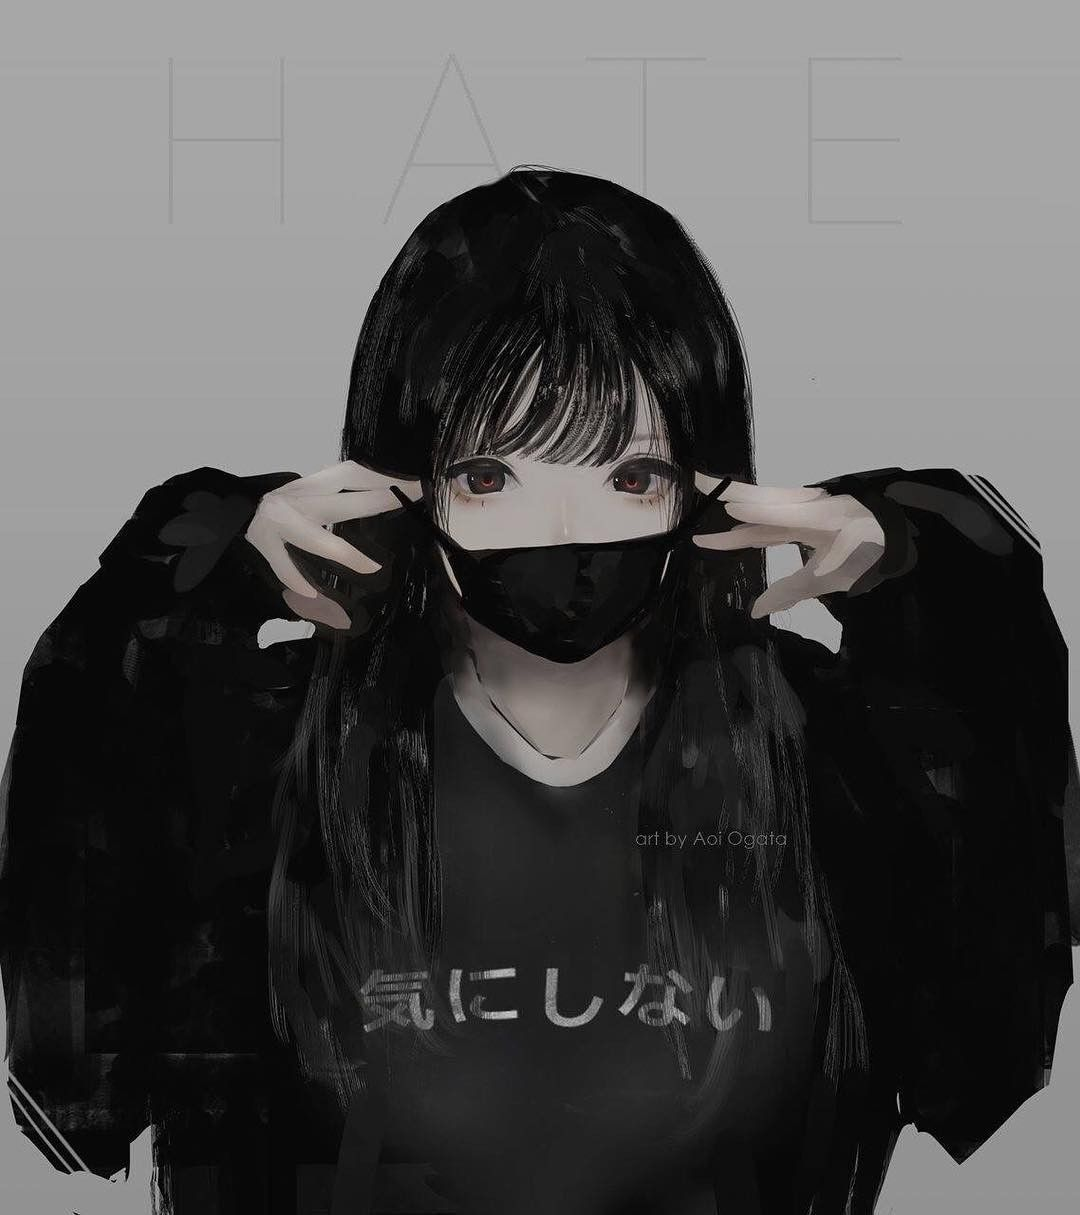 hair Emo anime black girl with